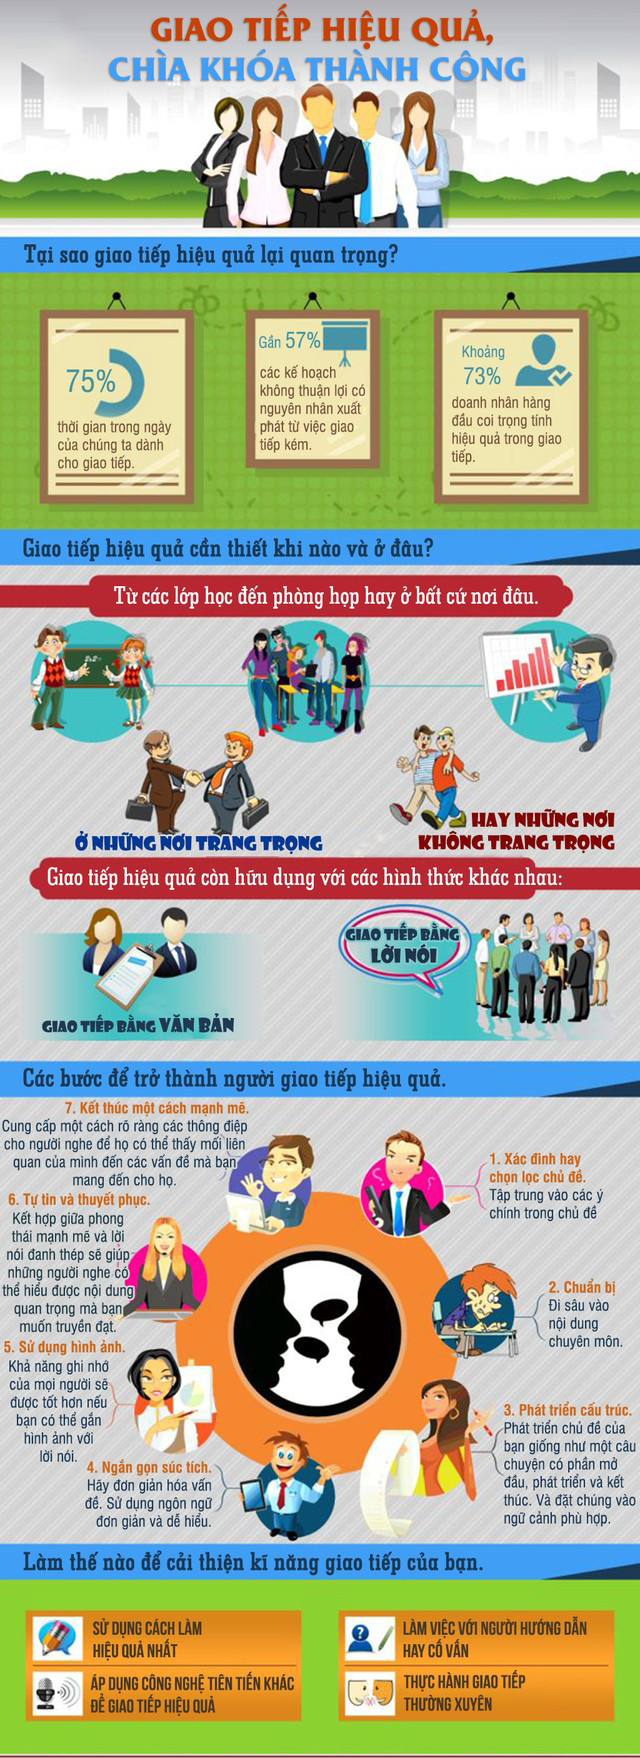 infographicgiao-tiep-hieu-qua-chia-khoa-thanh-cong.jpg